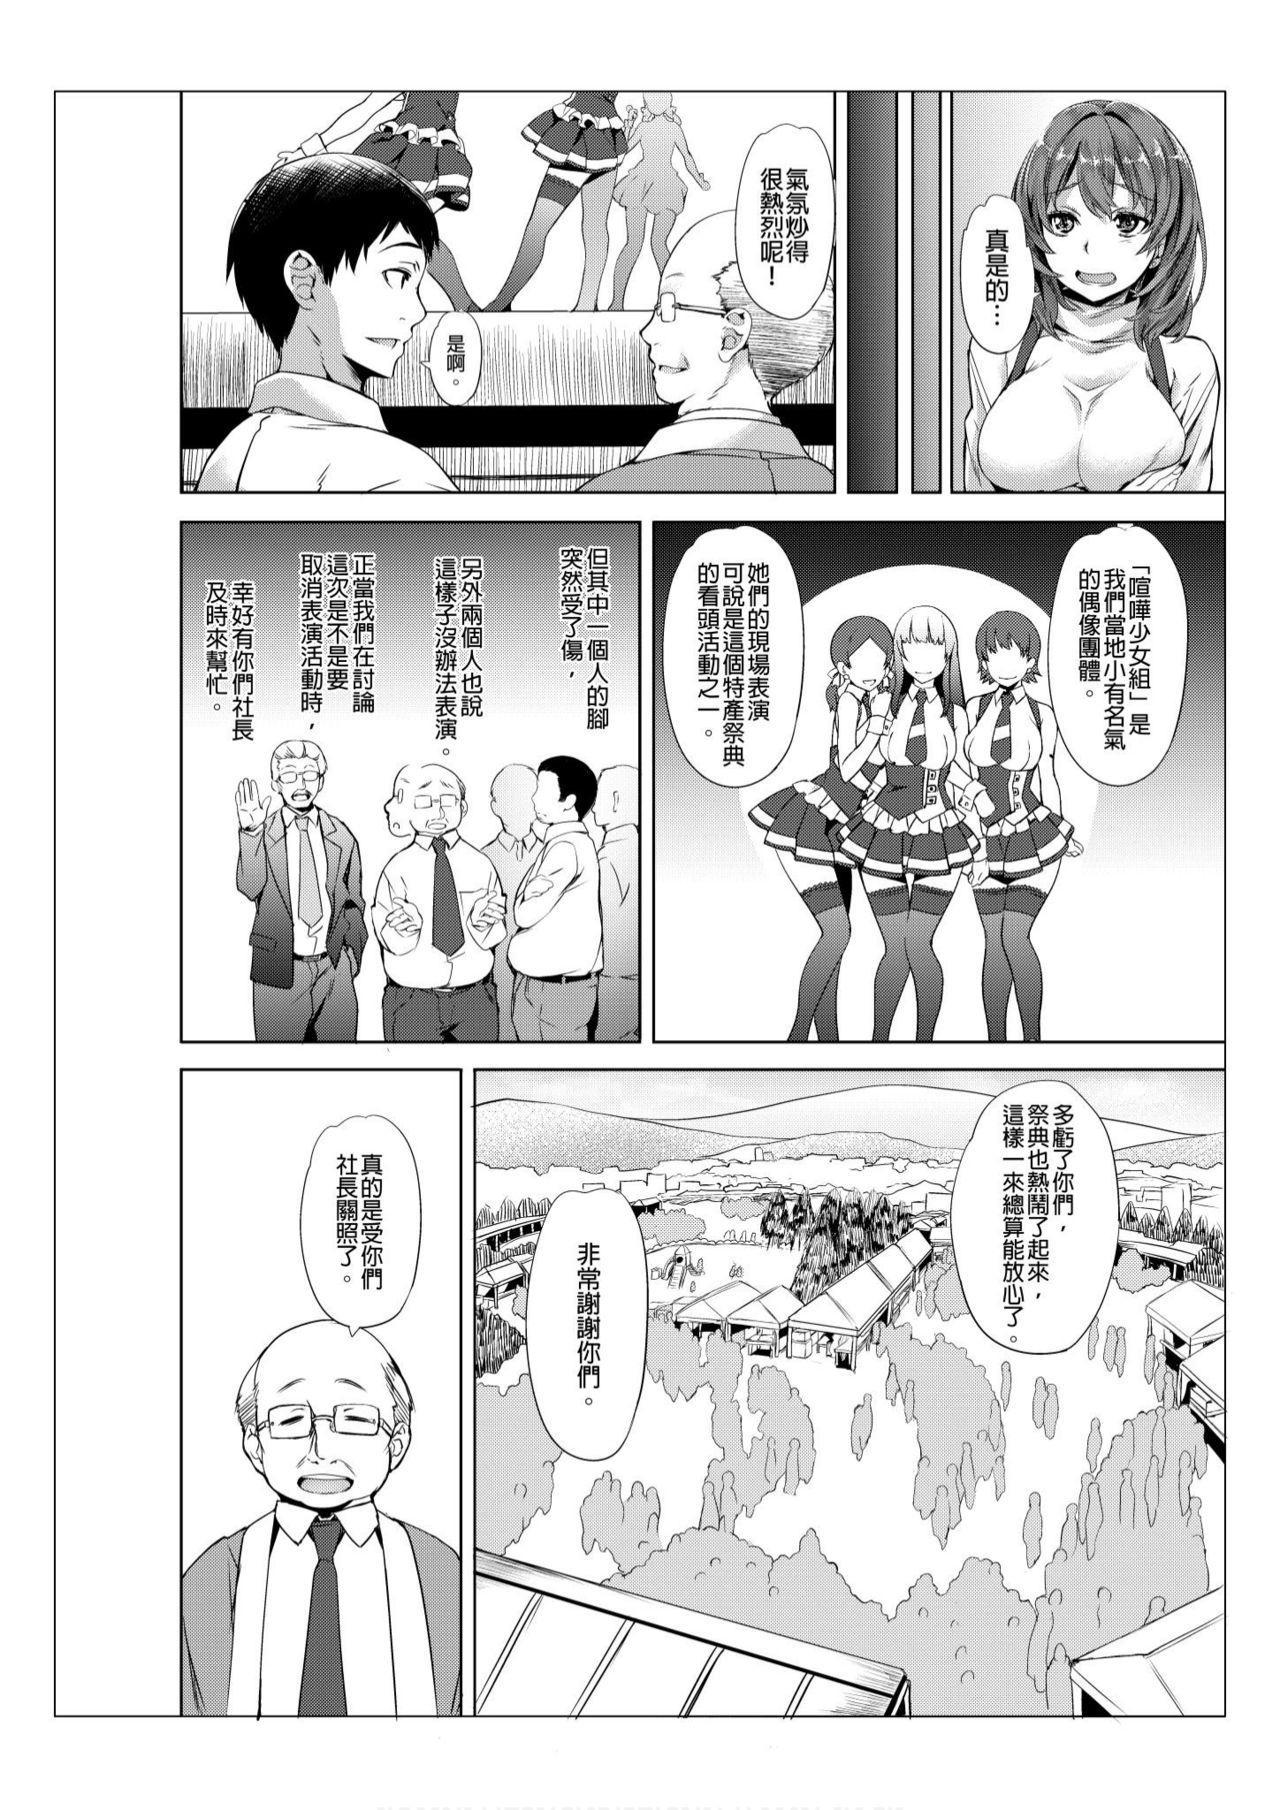 [Nagayori] Towel Ichimai de Otoko Buro.~ Shiranai Ojisan-tachi to Honiki Sex ~ | 只裹了條小毛巾就進男浴池的我。~被完全不認識的大叔們弄到高潮了~ [Chinese] [Decensored] 29